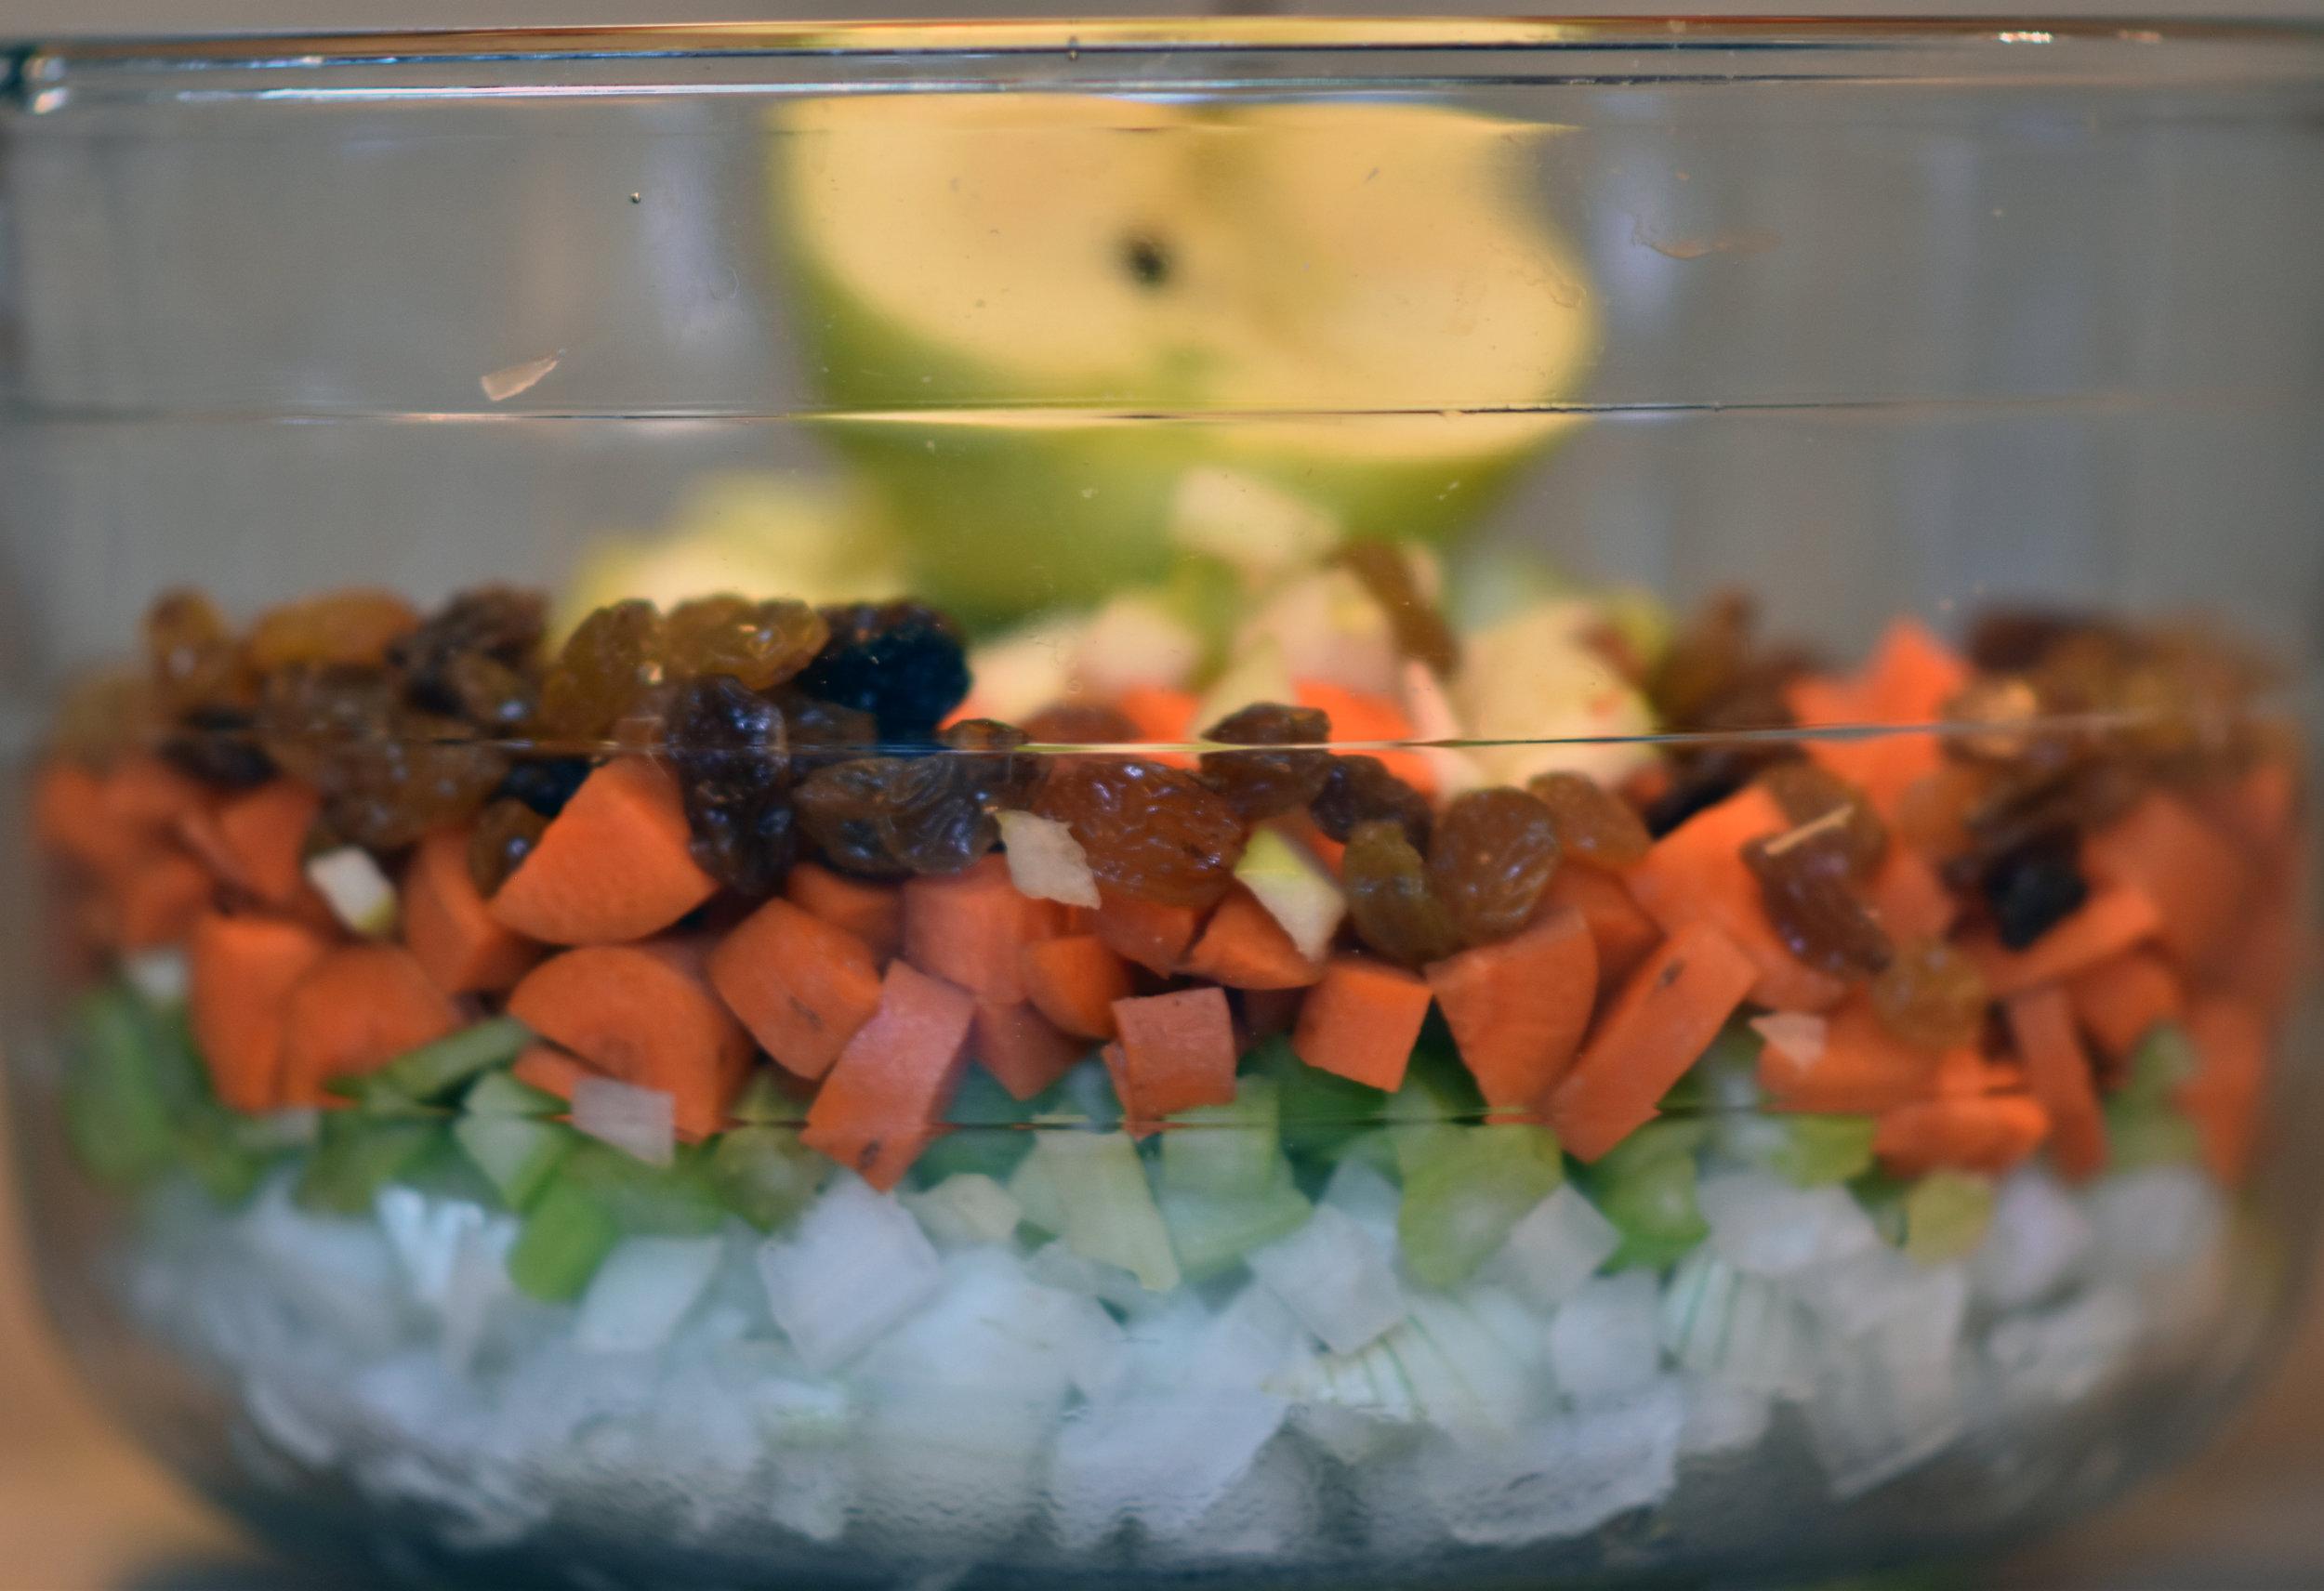 diced fruit & veggies - because yum